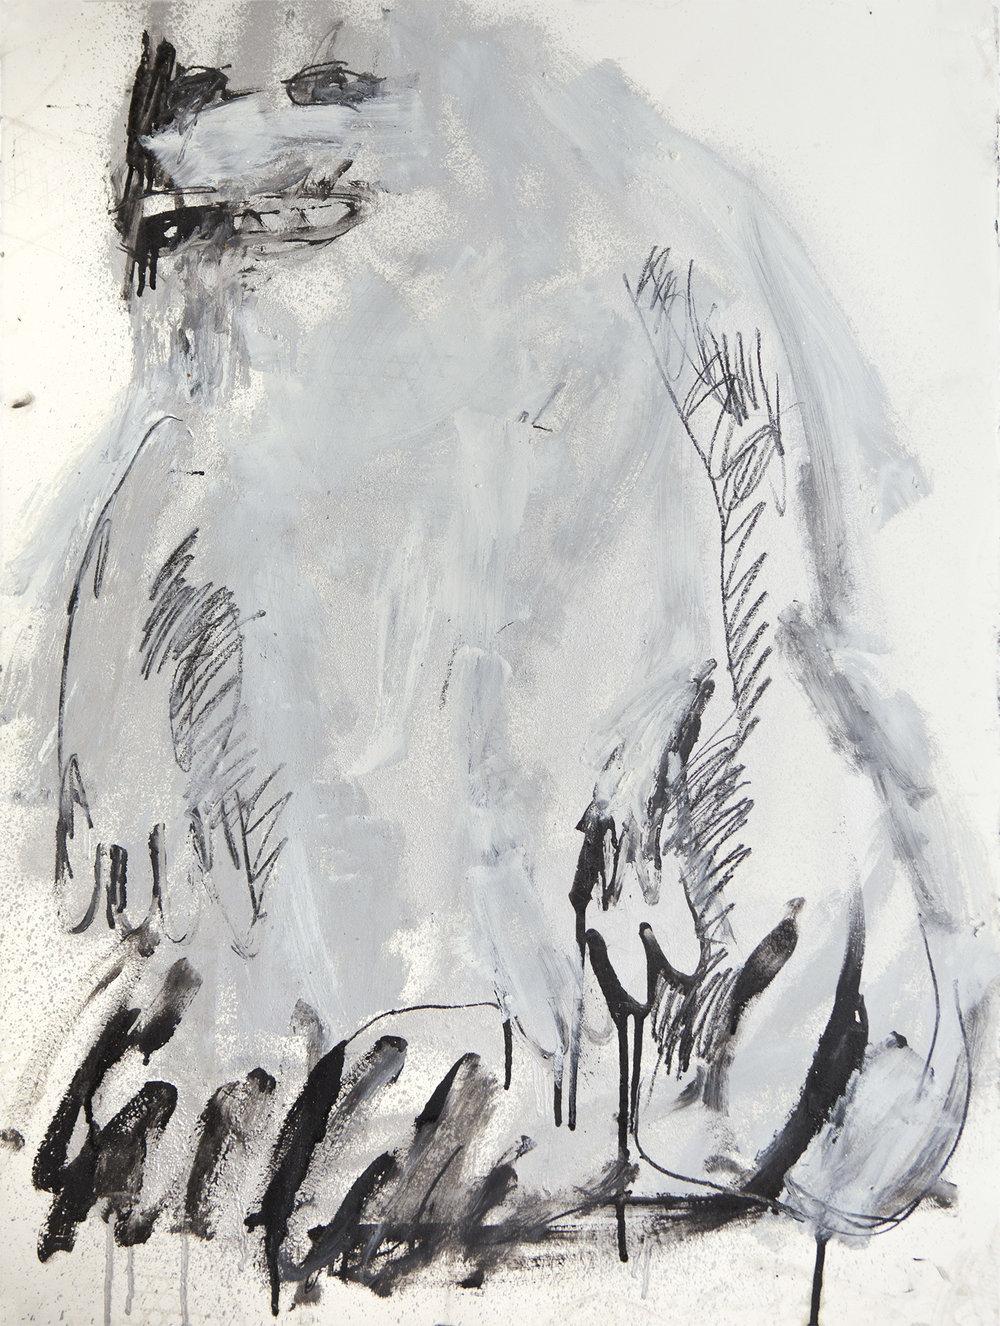 Psychedelic Silver Dream Ape, 2017